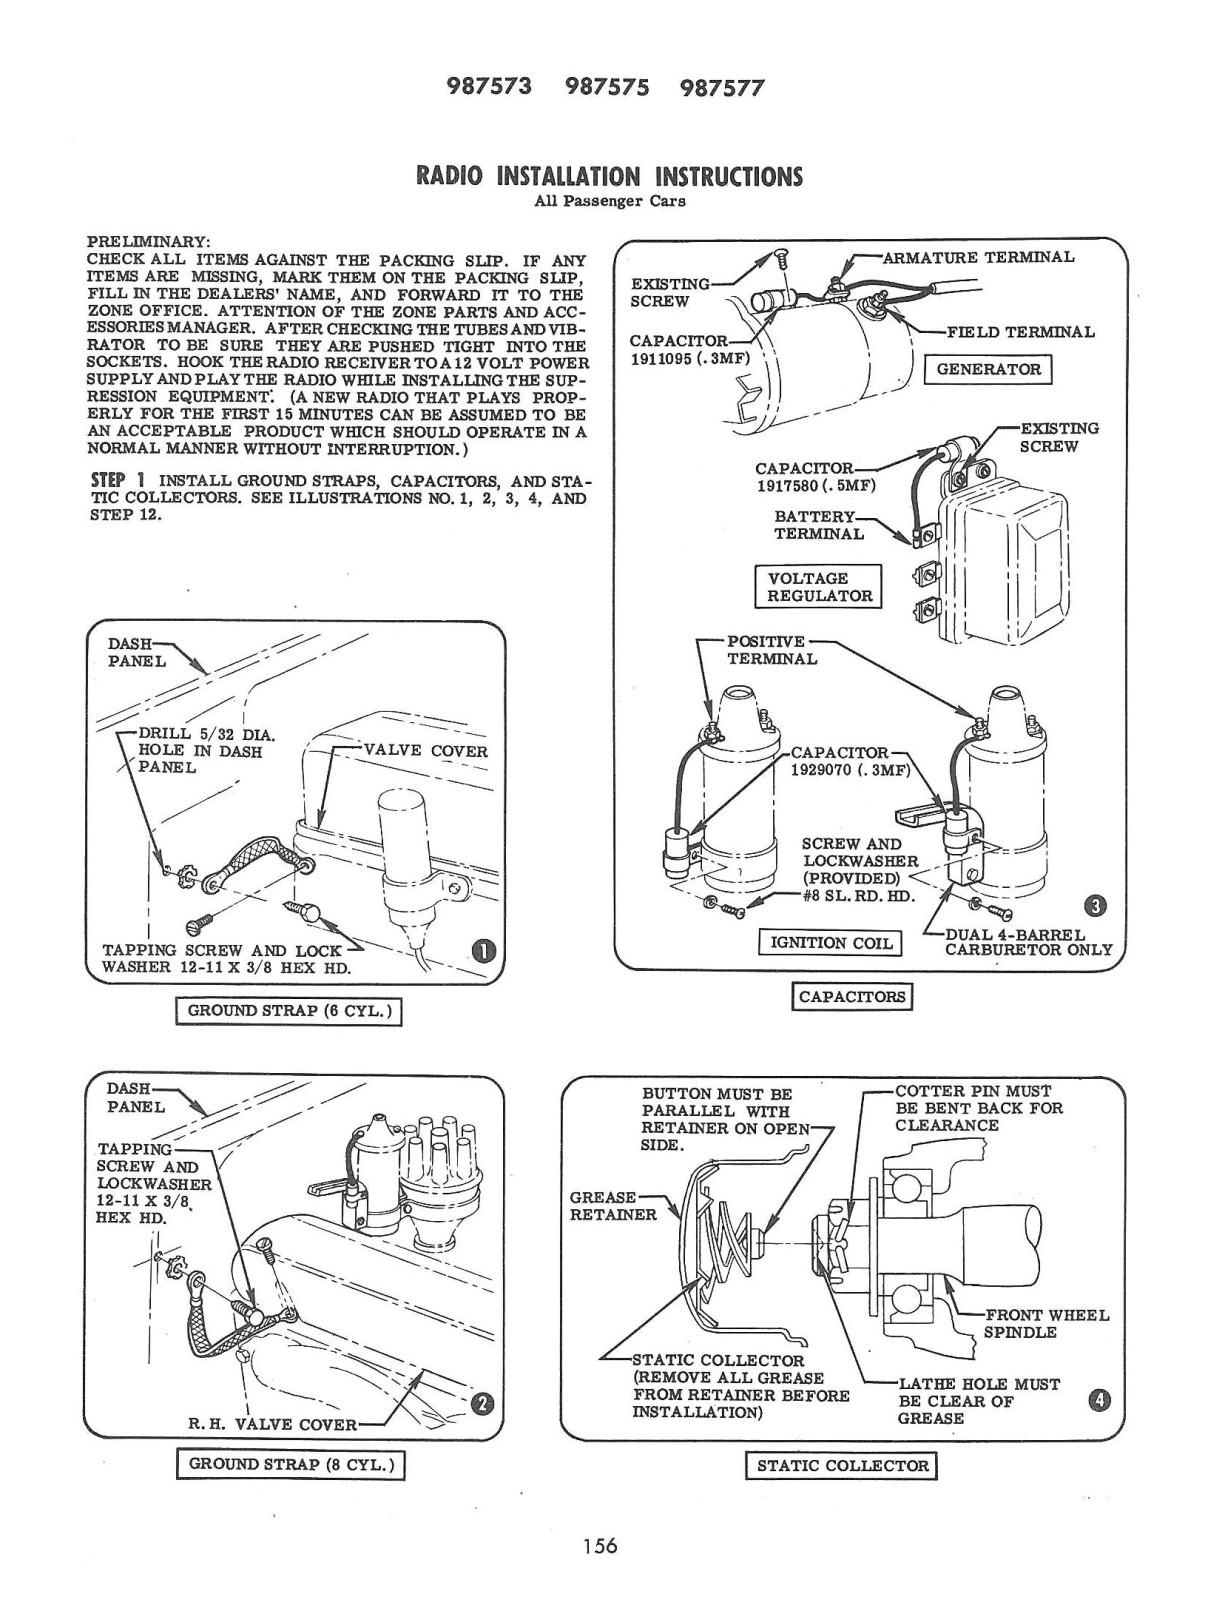 55 Chevy Dash Wiring Diagram Ground Straps Location Trifive Com 1955 Chevy 1956